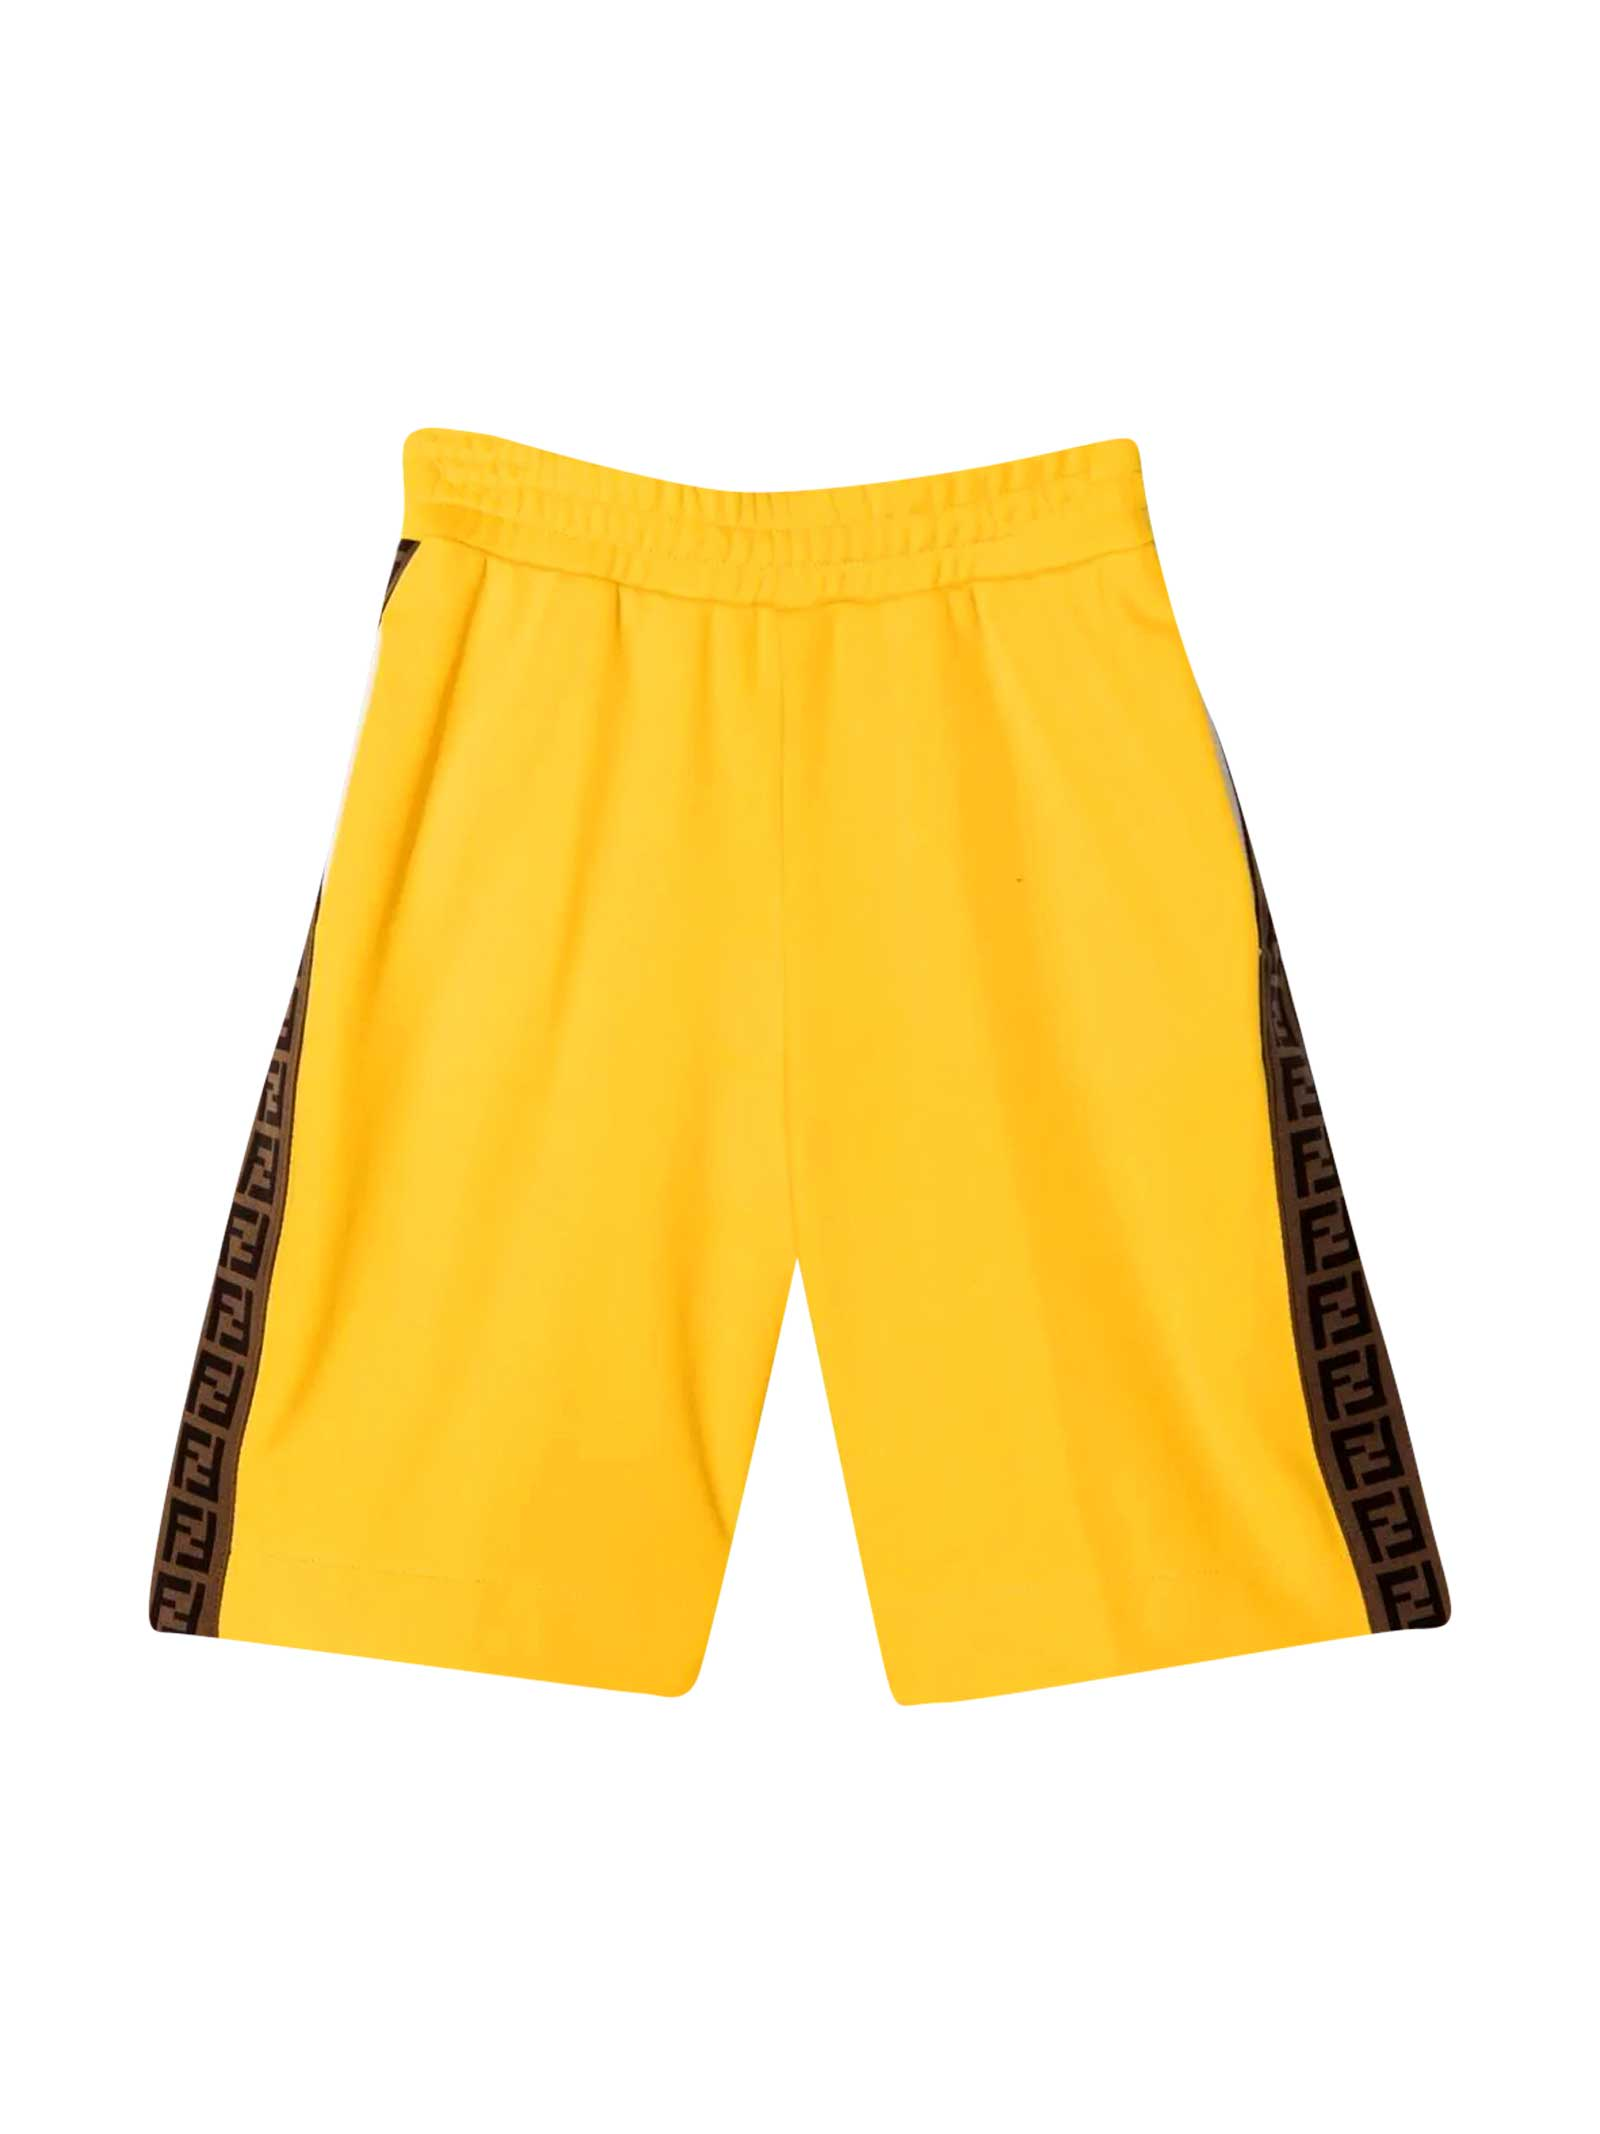 Fendi Clothing YELLOW TEEN BERMUDA SHORTS WITH LOGO SIDE BANDS